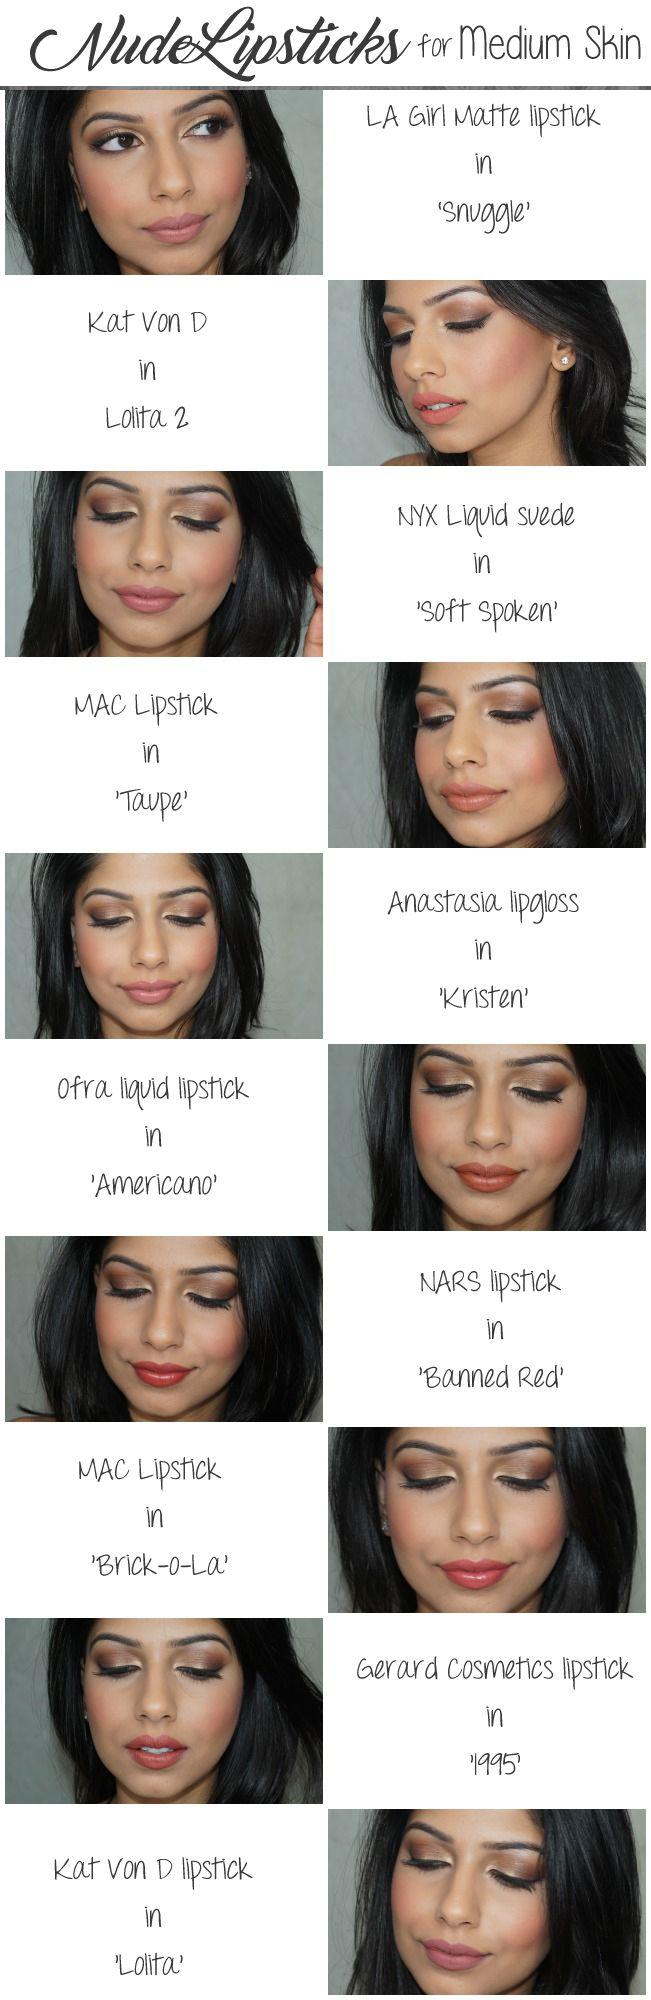 Best 25 Mac Lipstick Swatches Ideas On Pinterest  Mac -1134